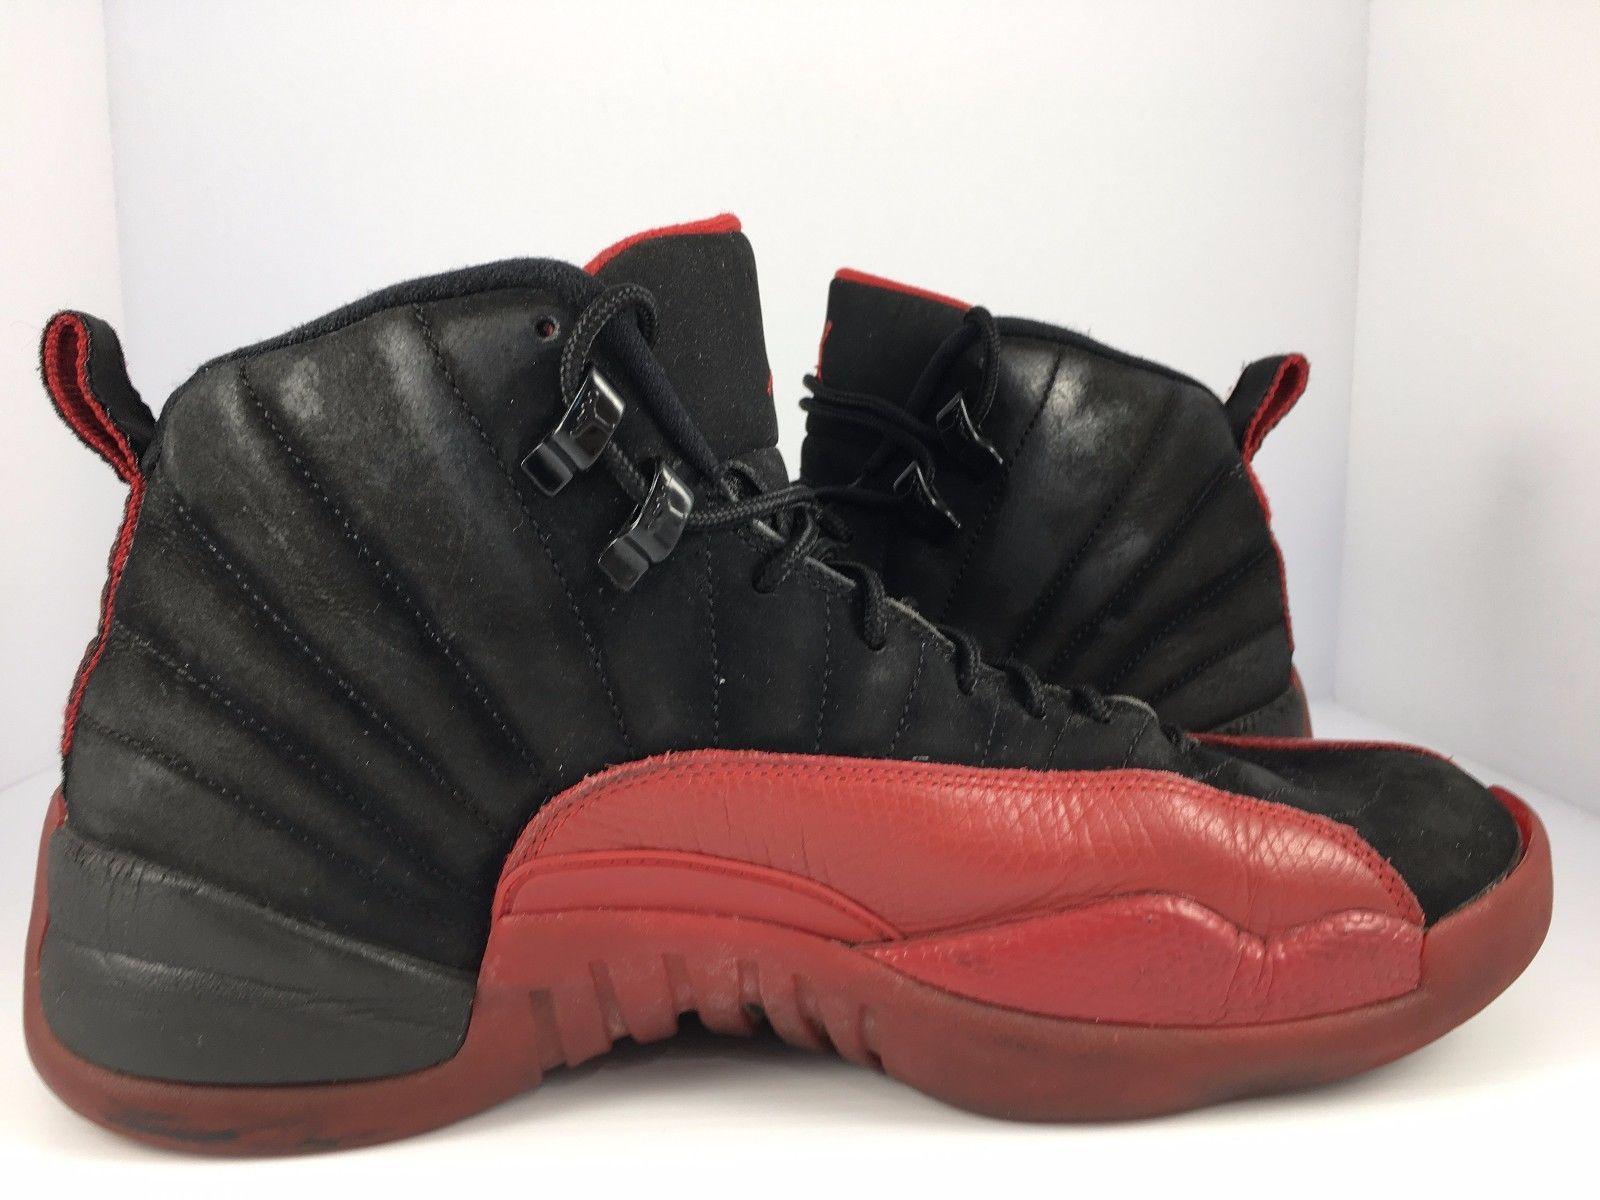 detailed look 0bf46 b3e97 ... Men s Nike Air Jordan XII 12